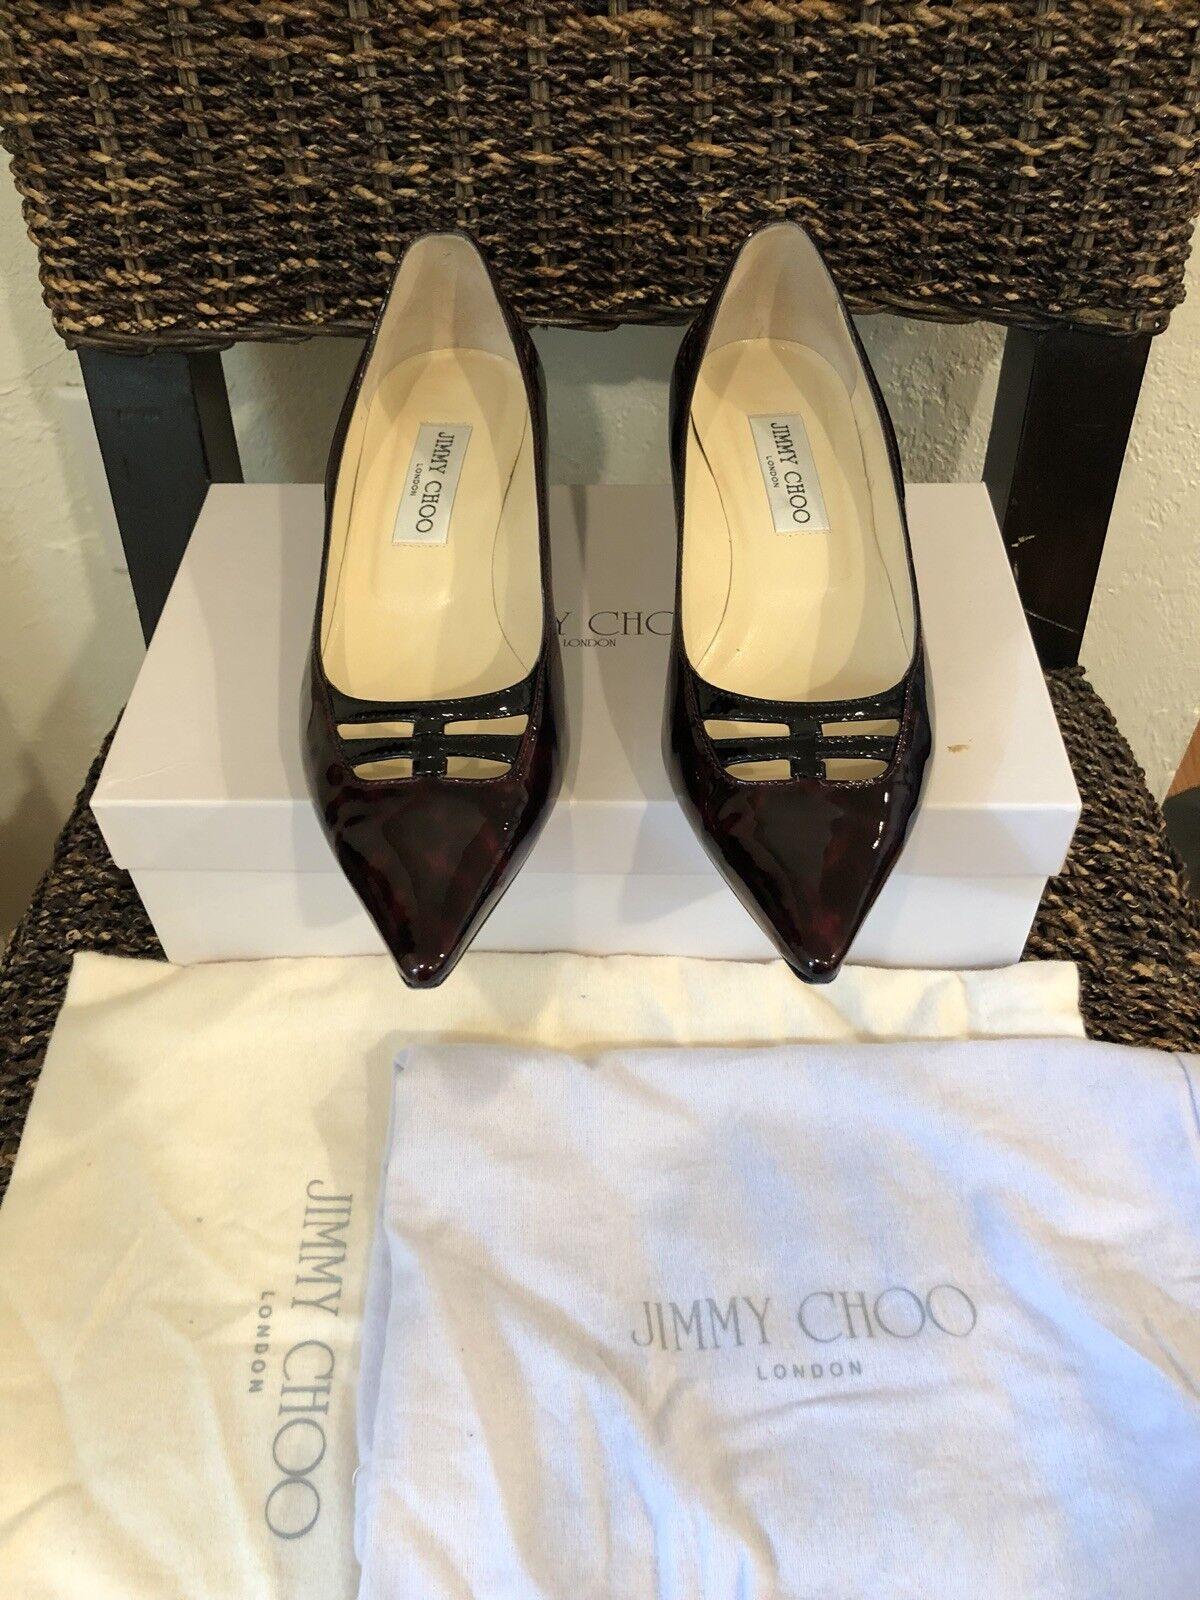 """JIMMY CHOO"" Leopard Print Patent Leather Heels Heels Heels Sz 37.5 Us 7.5 Excellent Conditi 8c9ff1"